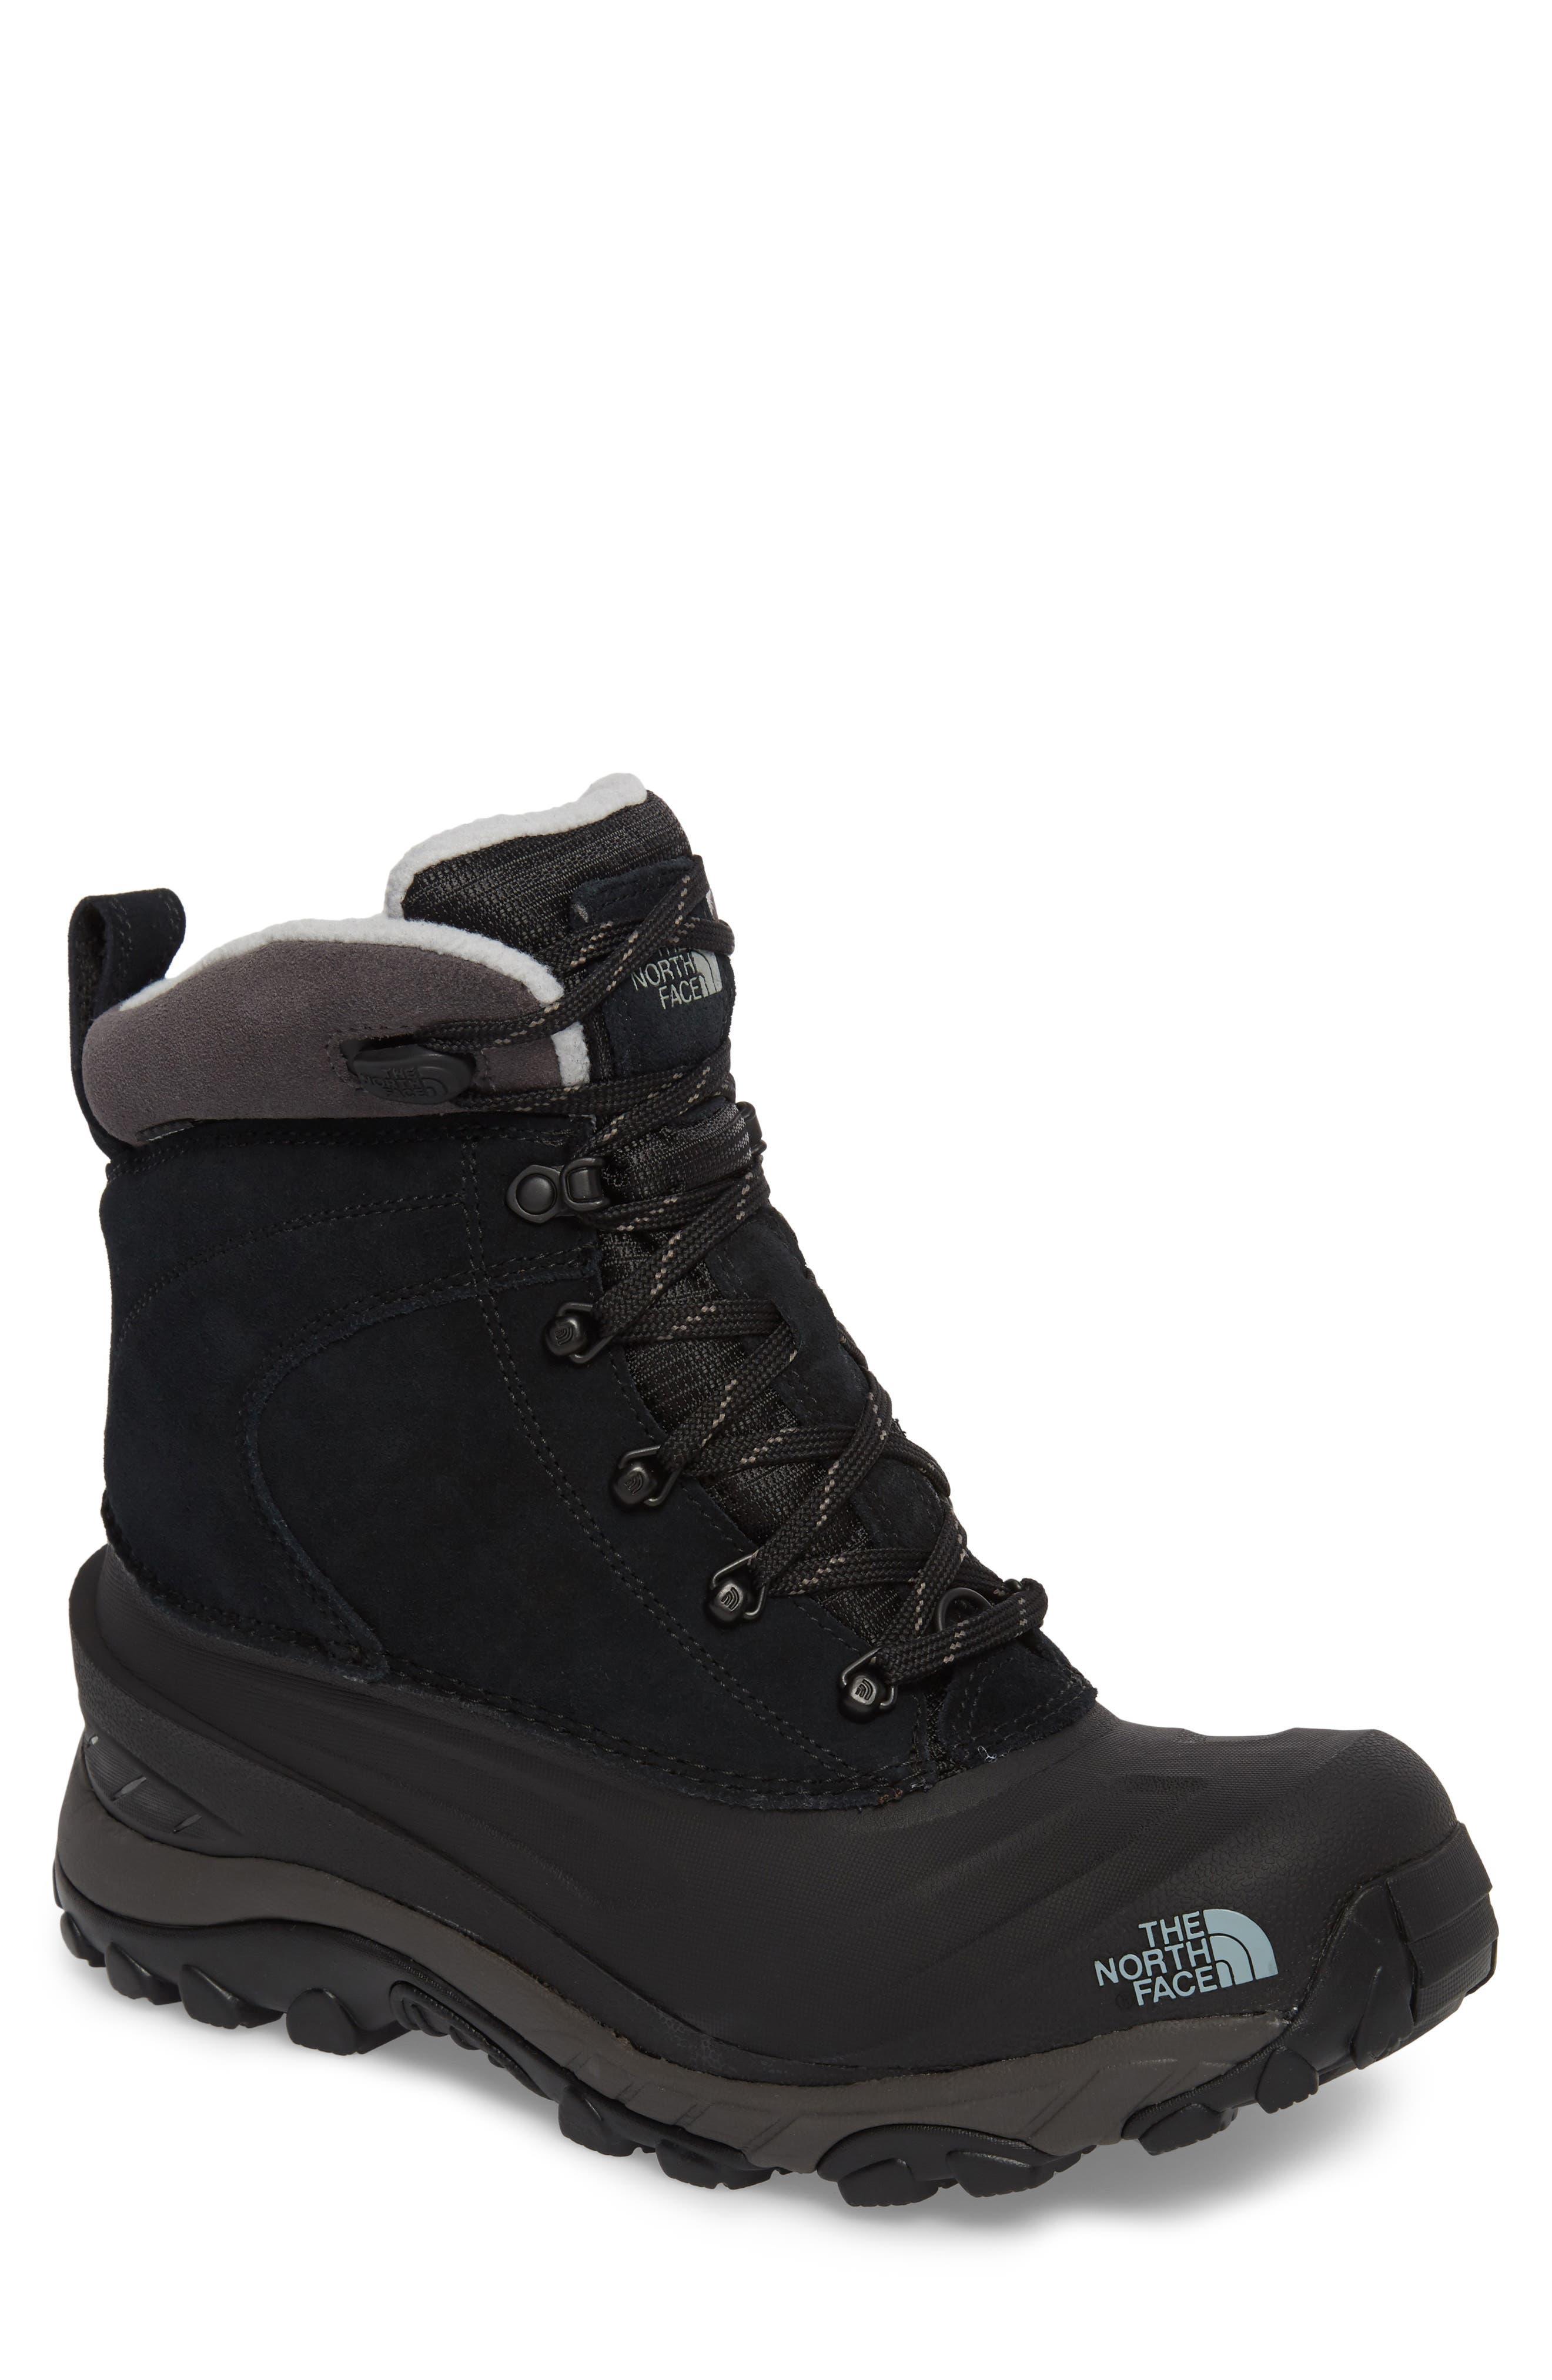 Chilkat III Waterproof Insulated Boot,                             Main thumbnail 1, color,                             TNF BLACK